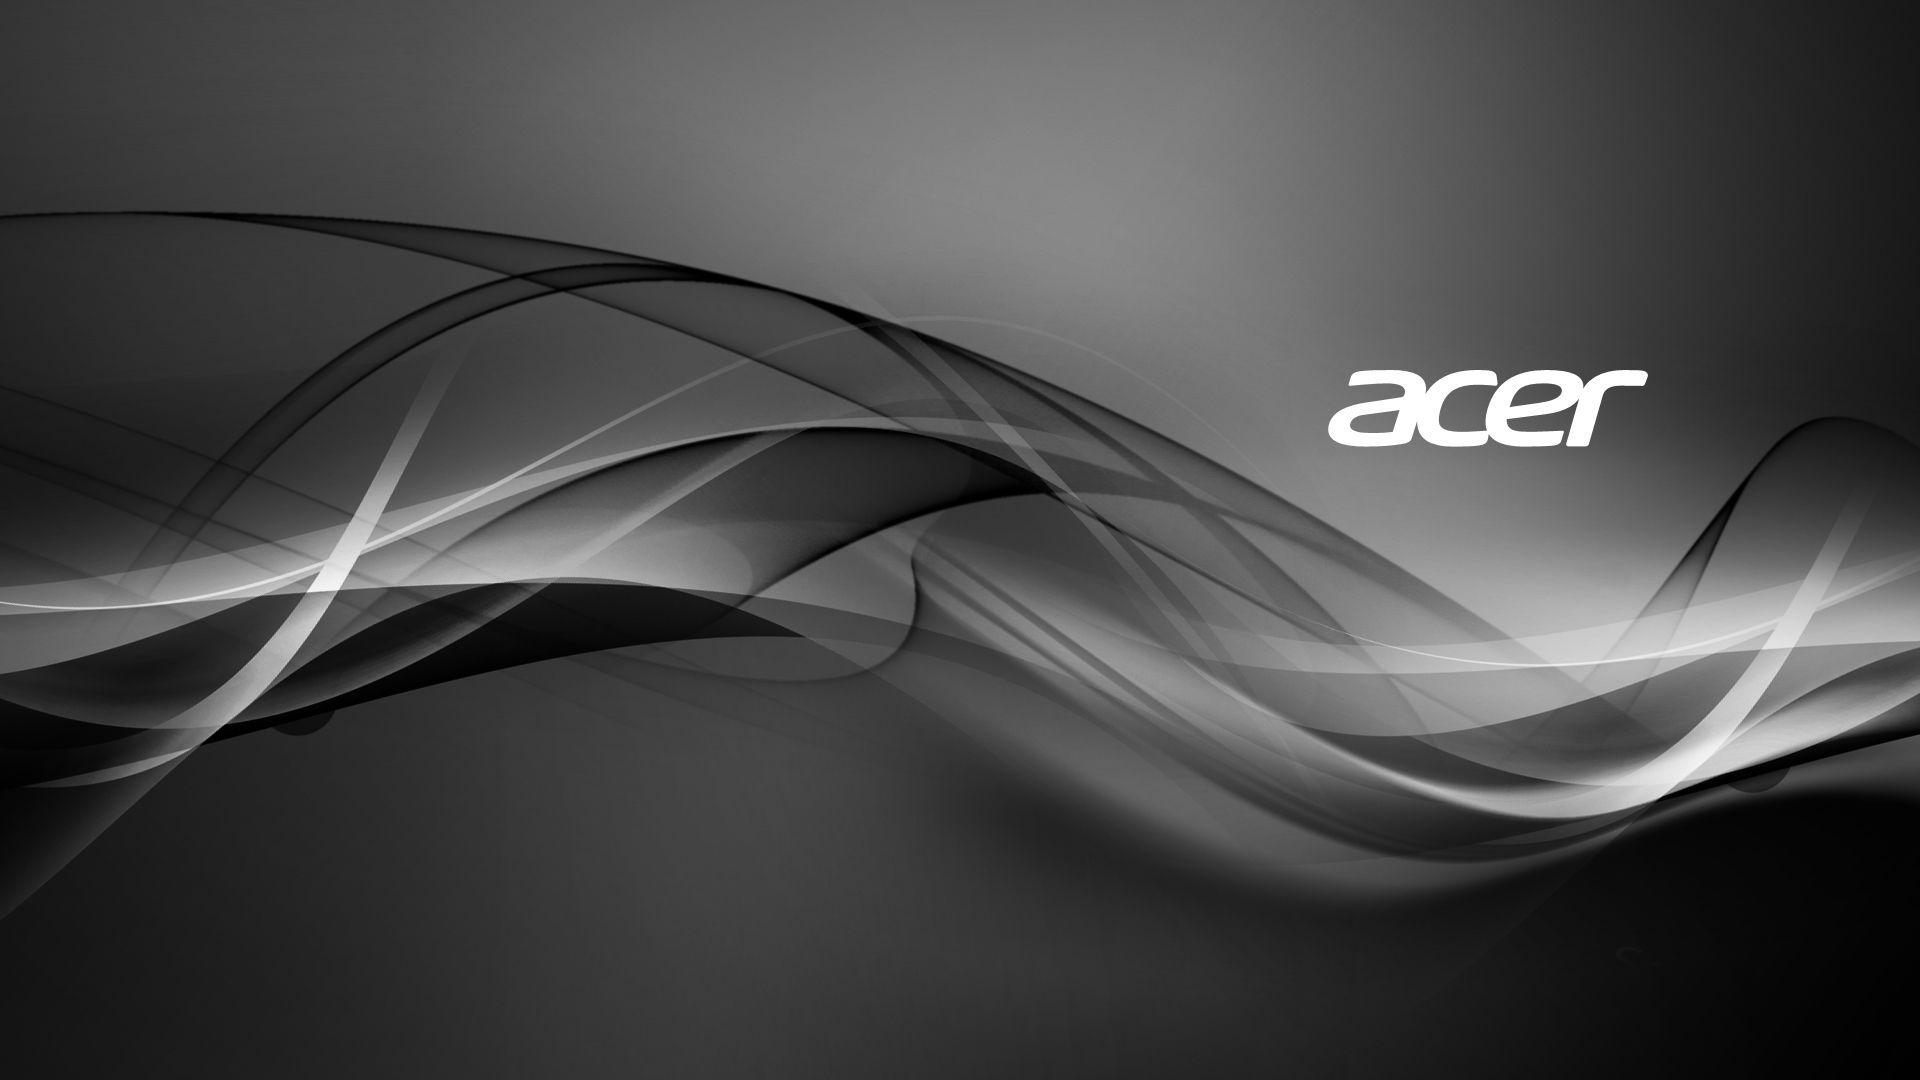 Image Result For Acer Gambar Tablet Acer